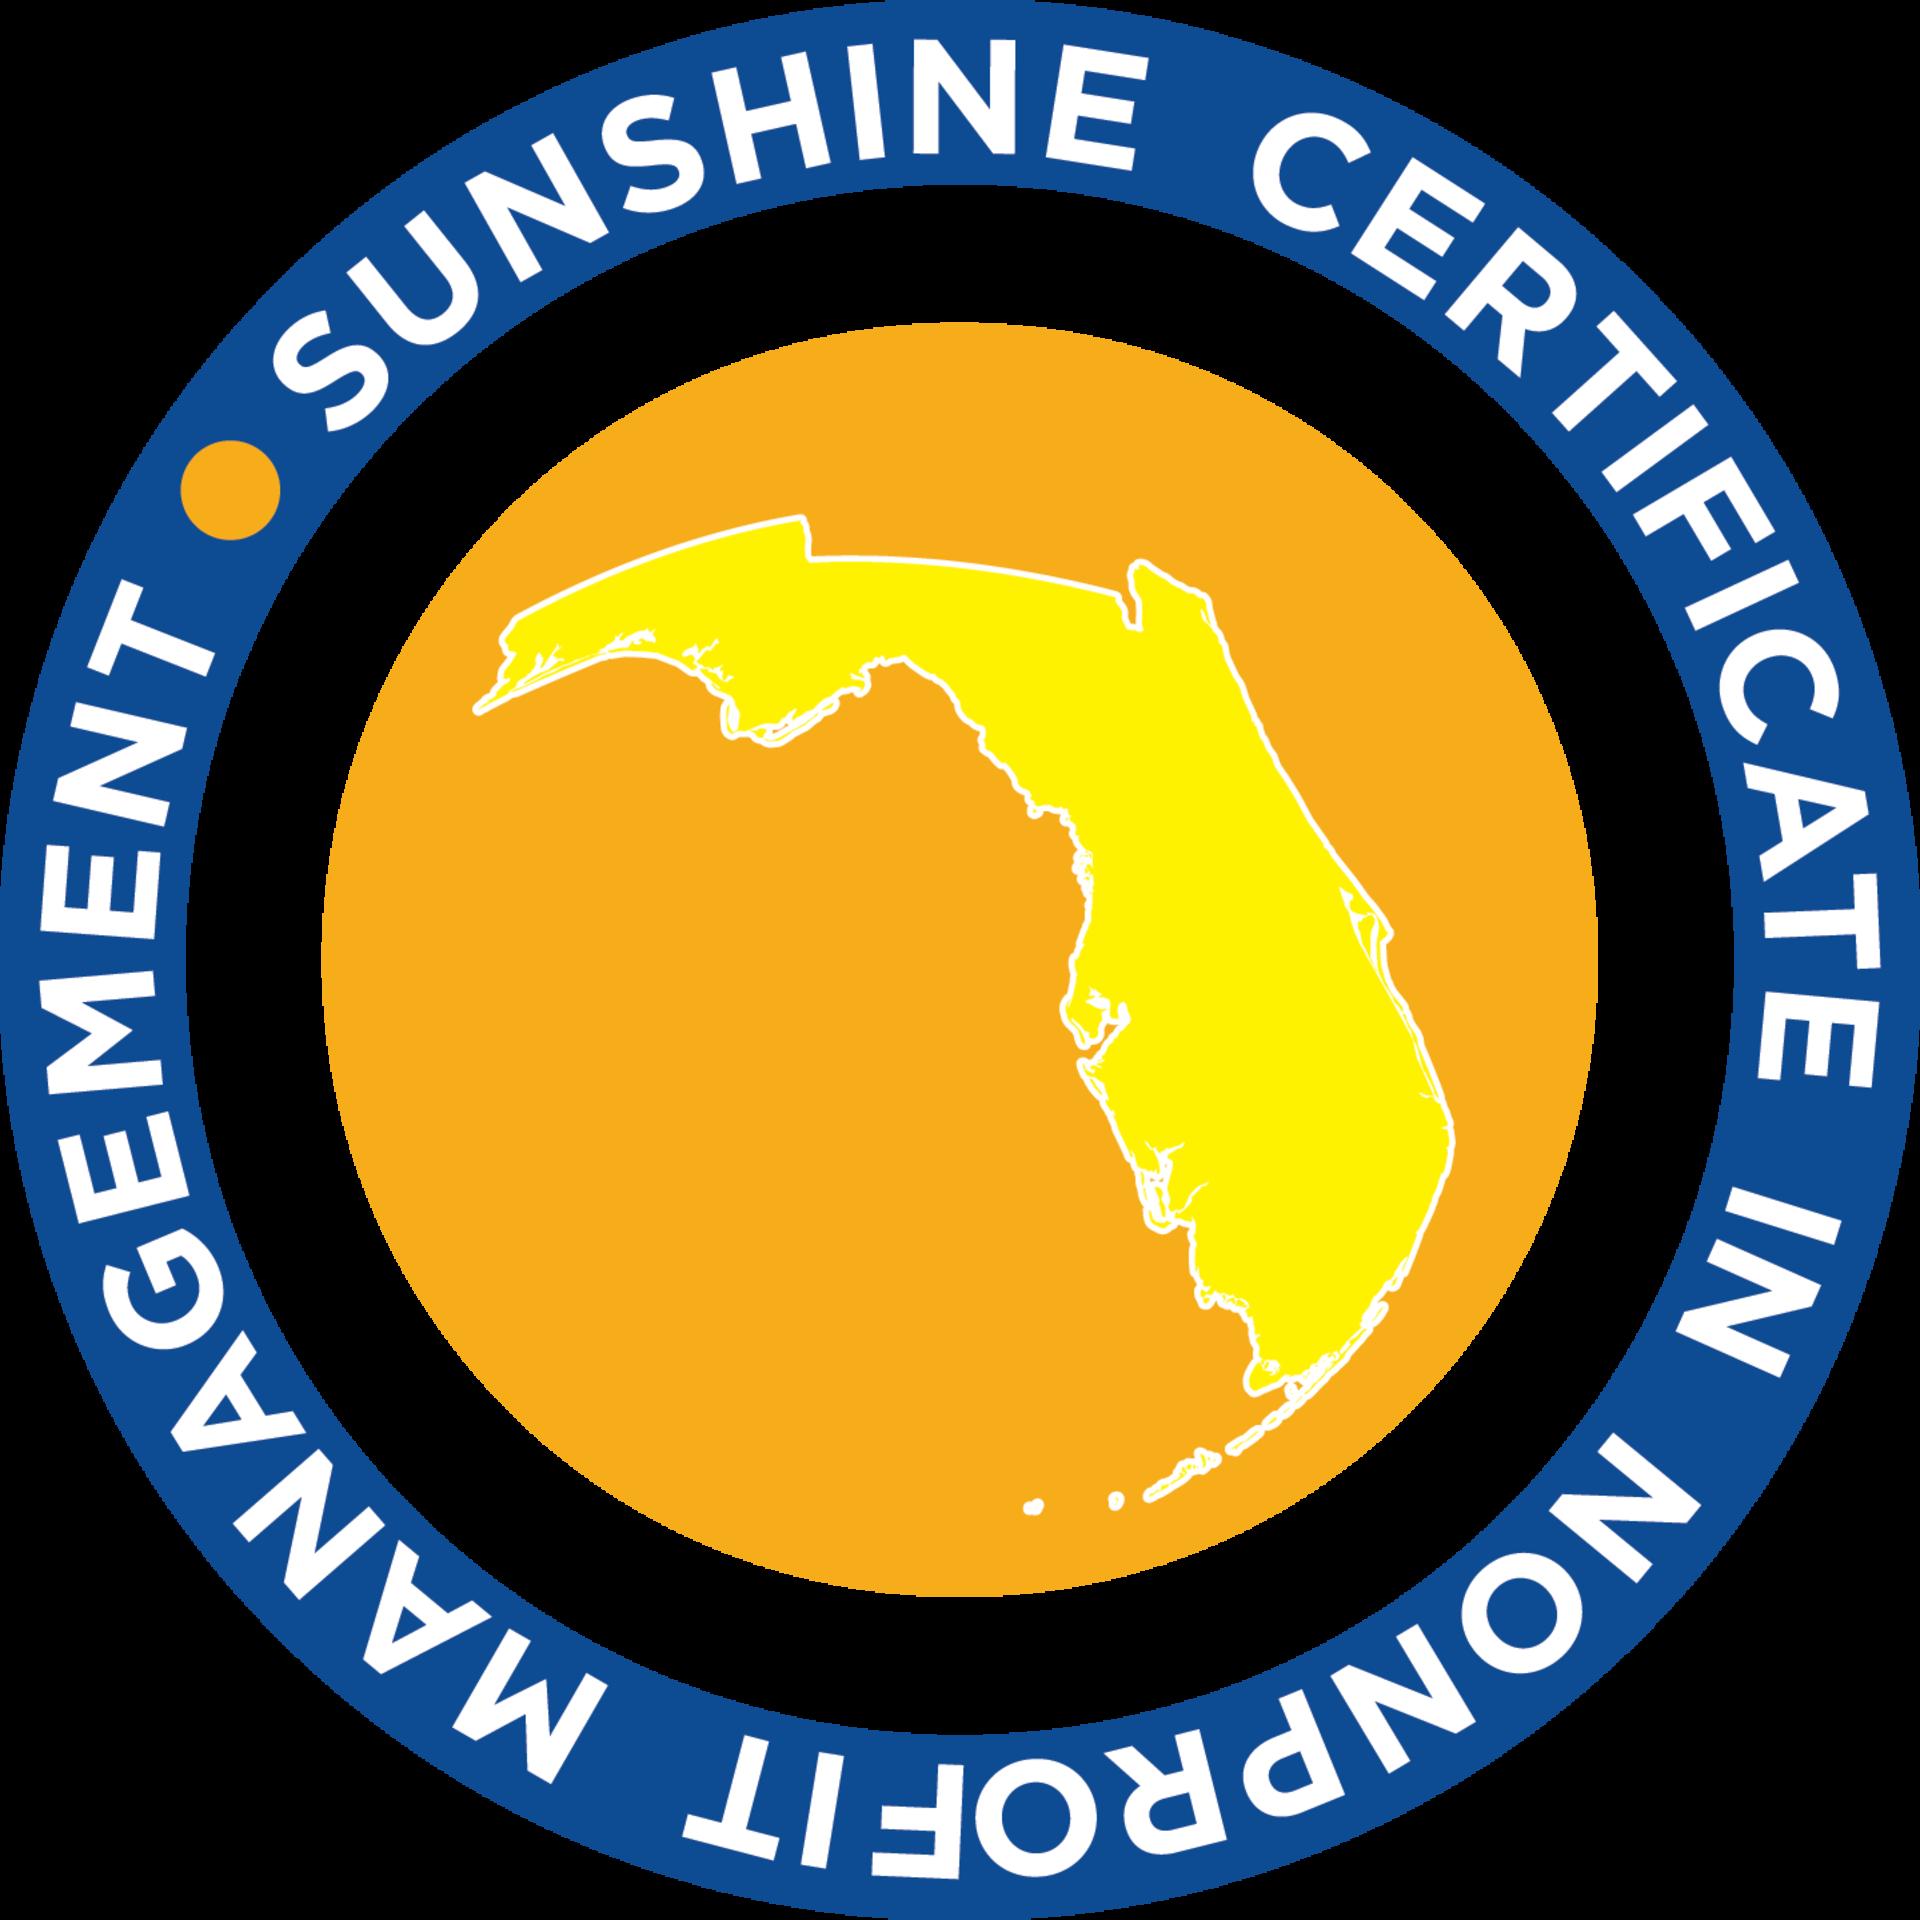 Florida Nonprofits' Sunshine Certificate in Nonprofit Management